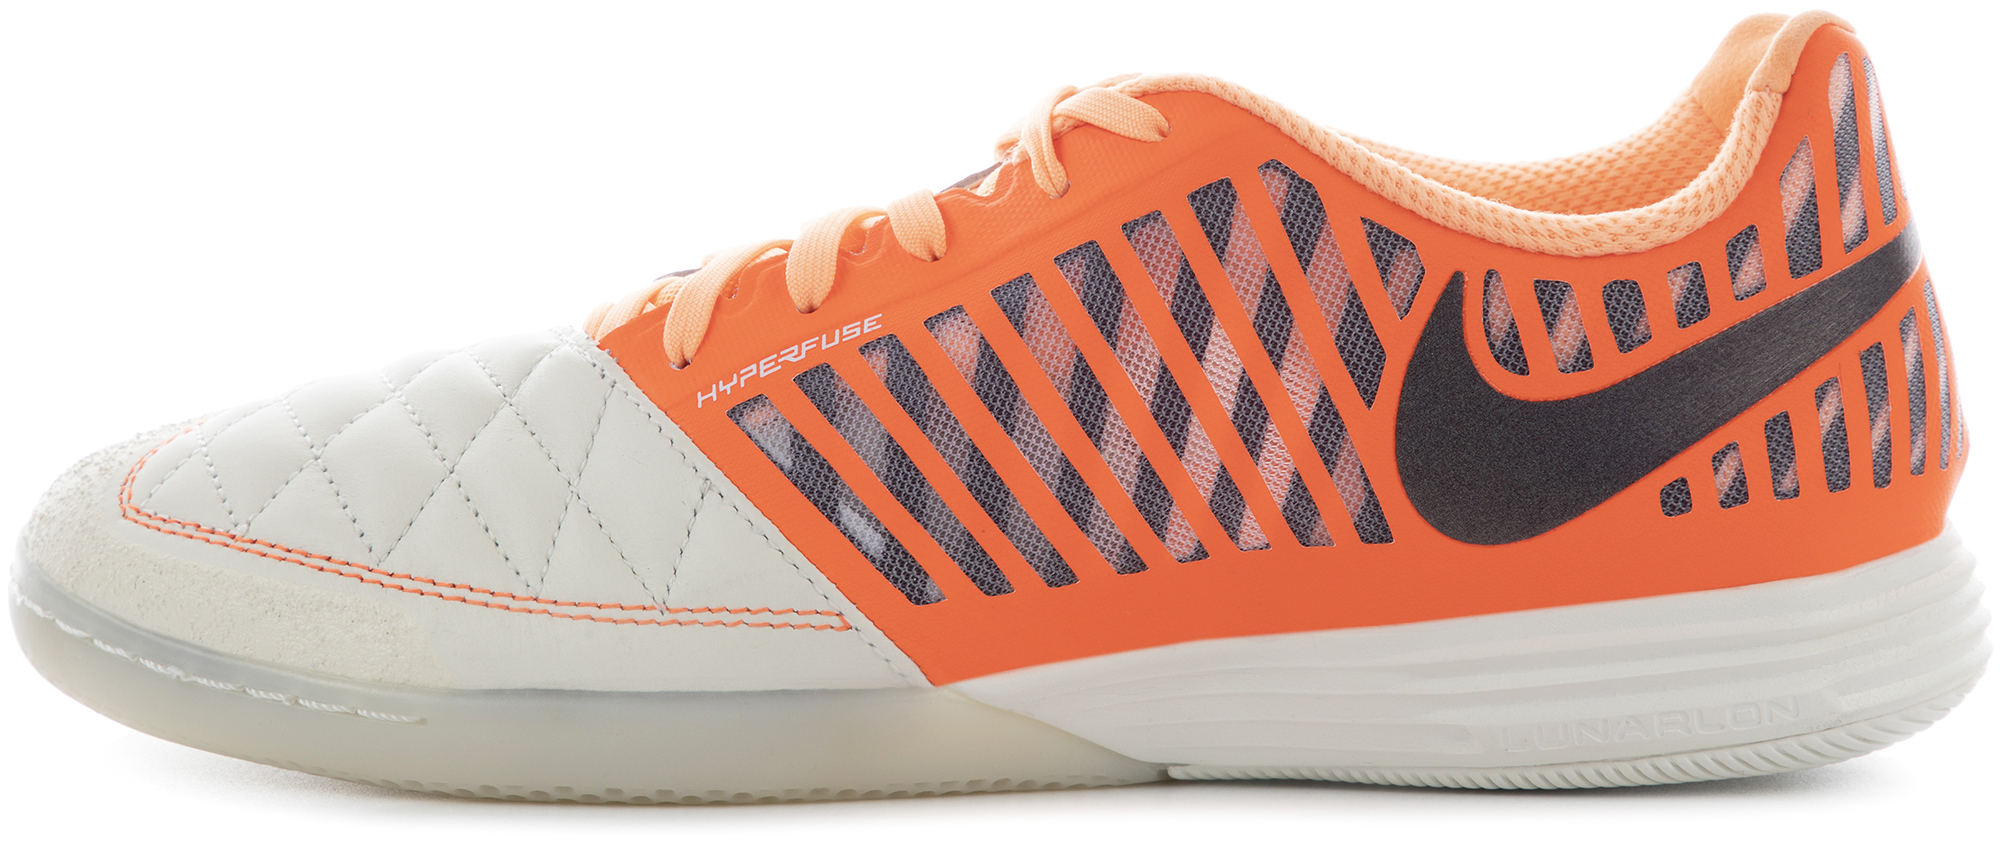 Nike Бутсы для зала мужские Lunargato II, размер 44